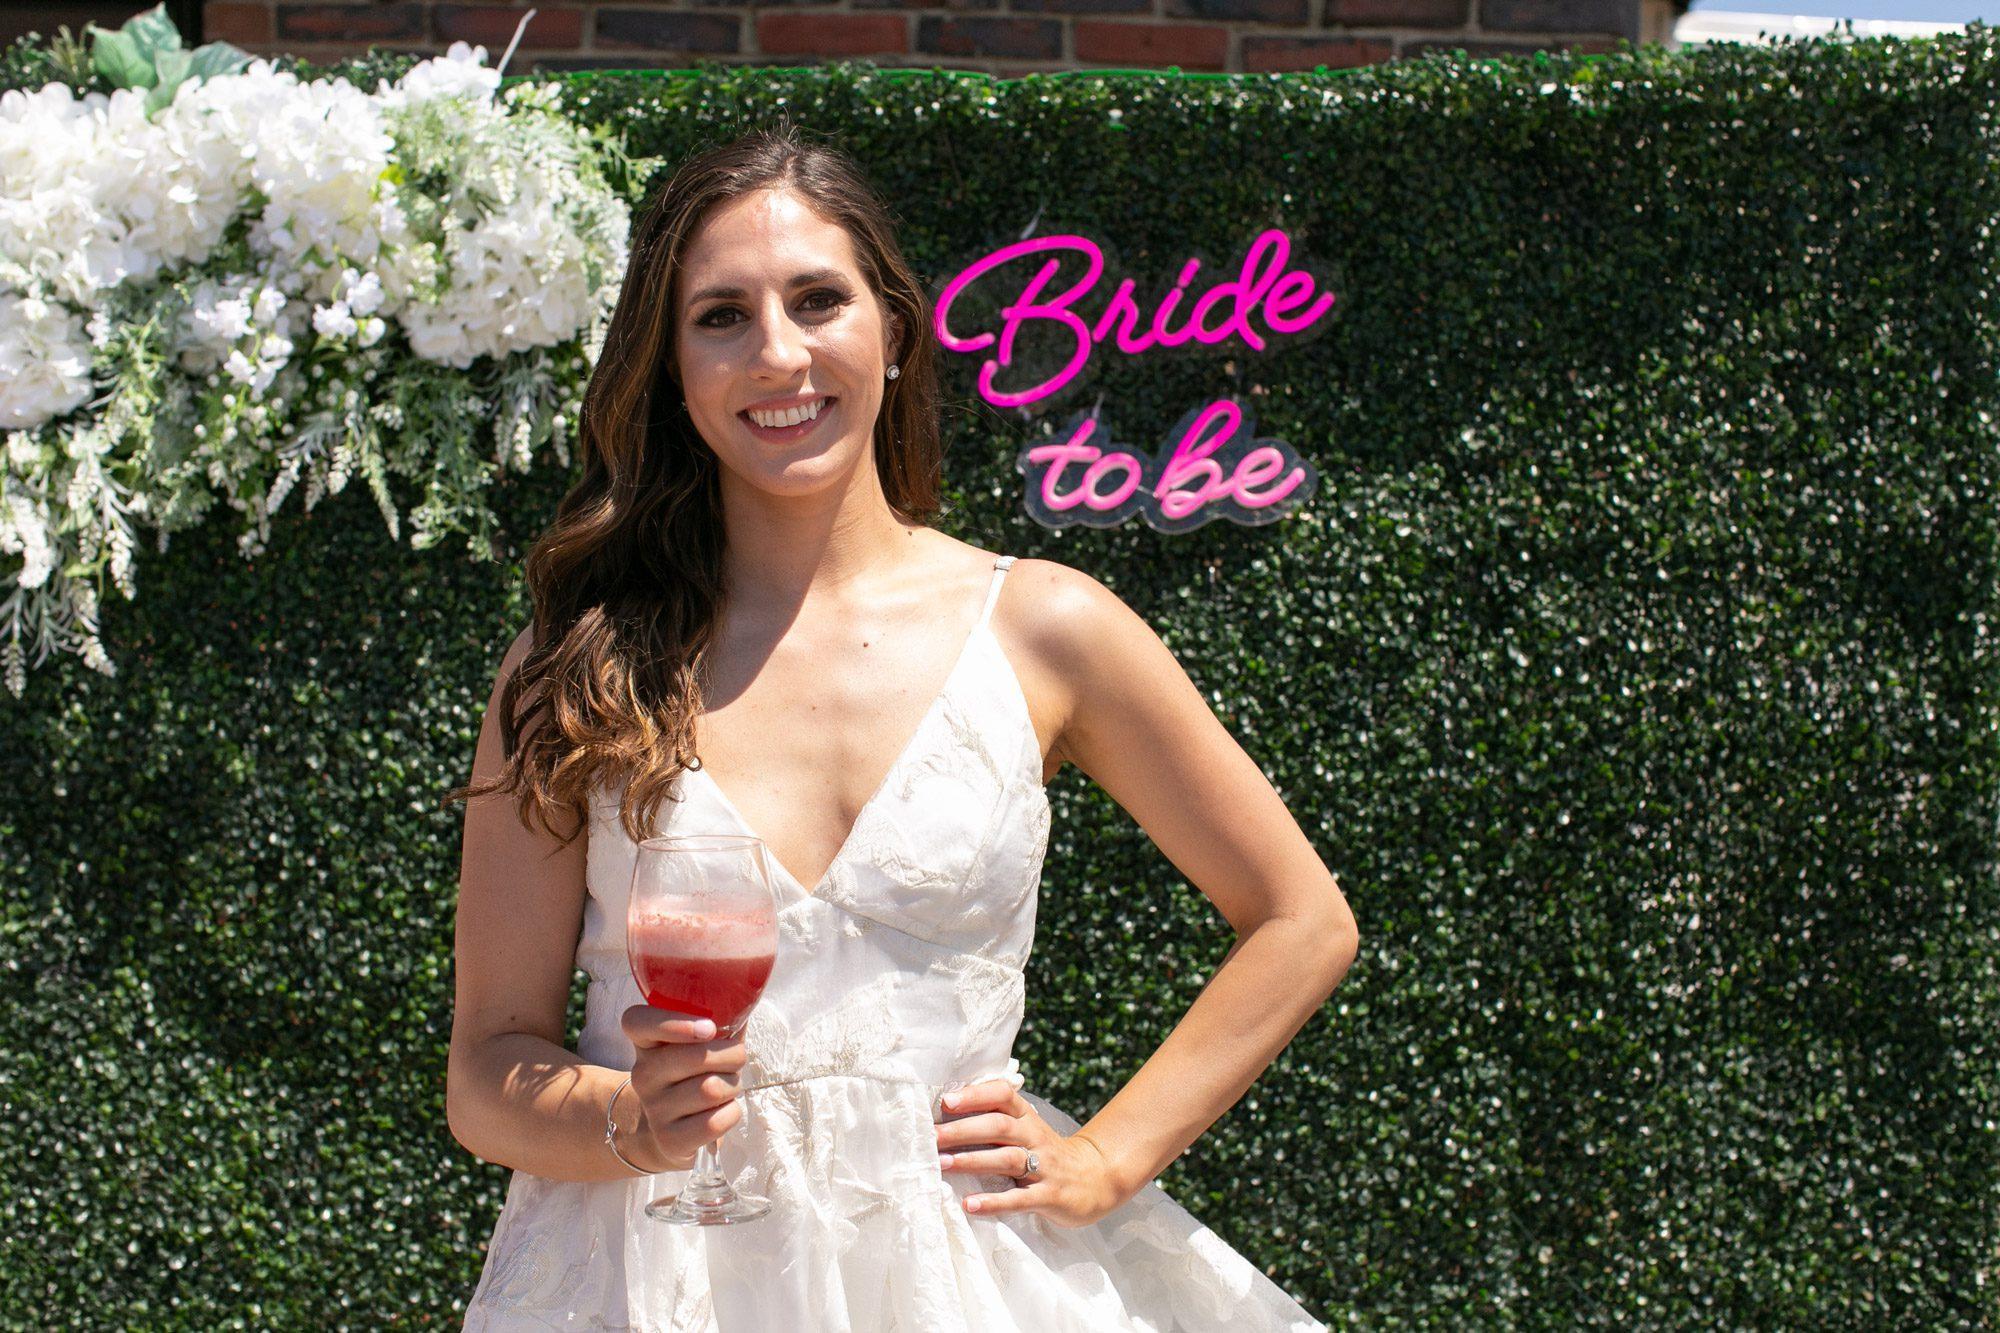 The bride at her bridal shower at Danversport in Danvers, Massachusetts